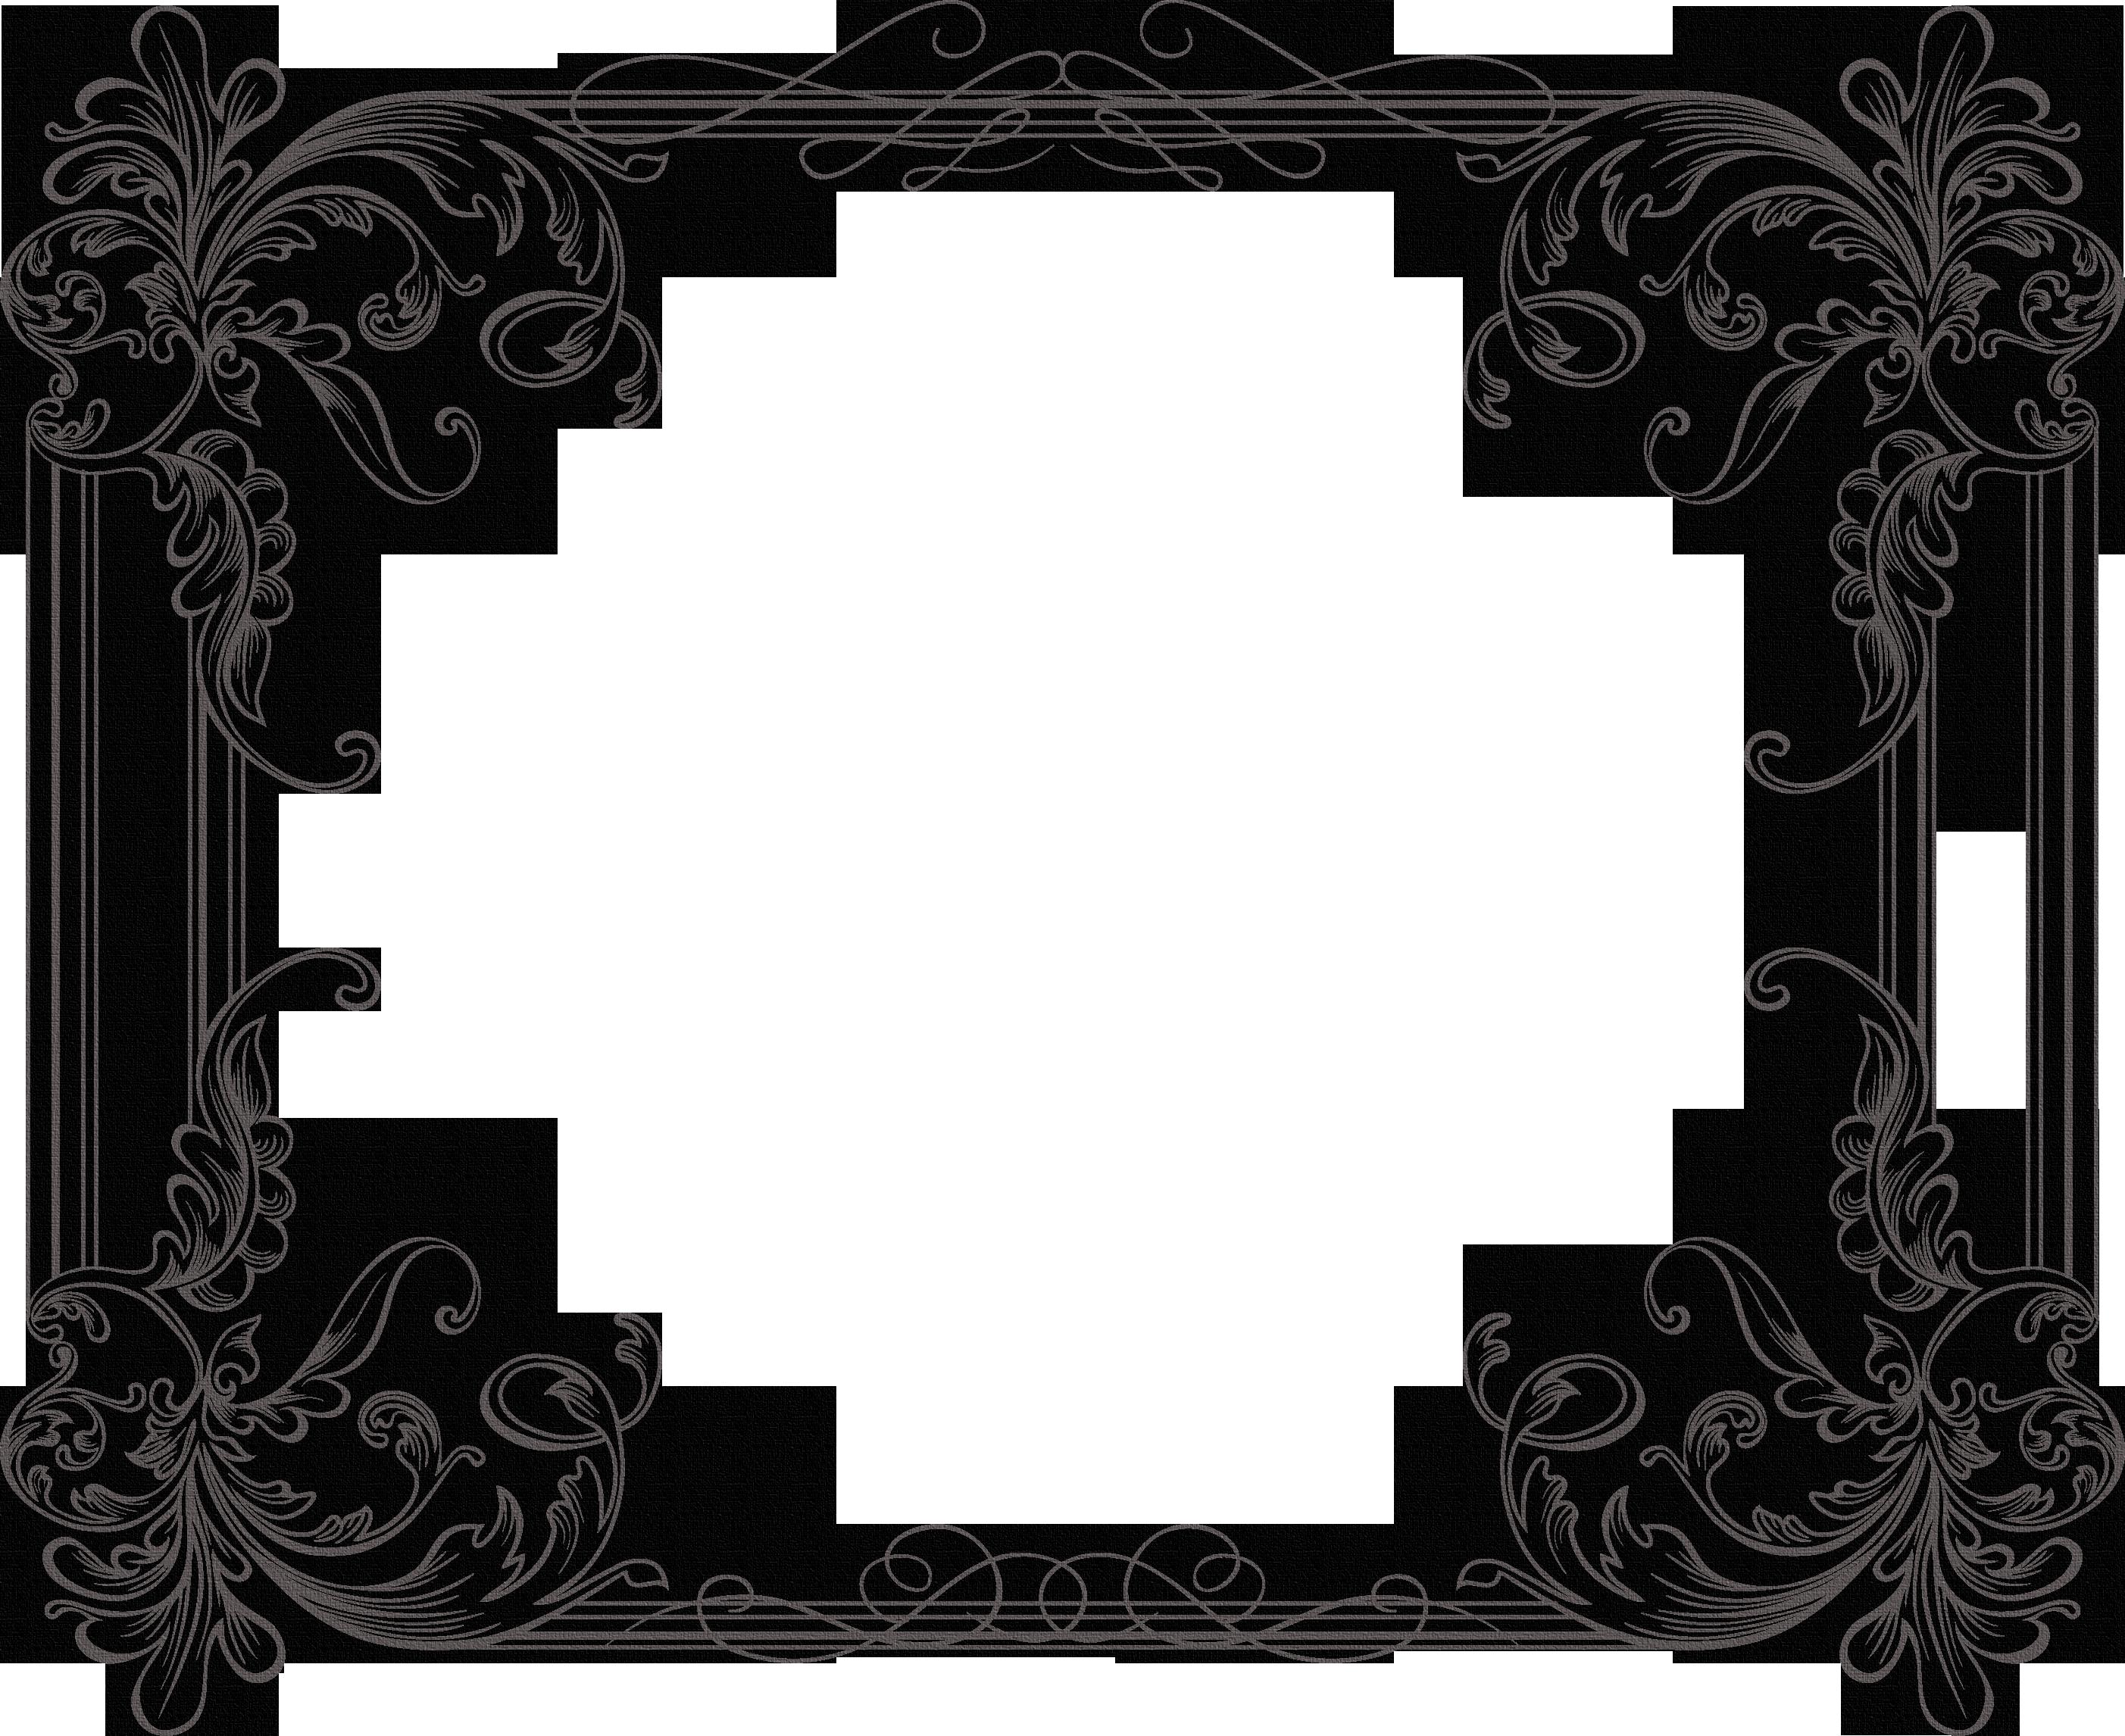 Pin by mary barnes ekobena on assorted frames for artwork craft frames paper frames decorative frames vintage frames embroidery patterns stencil patterns background images paper art diy paper jeuxipadfo Image collections